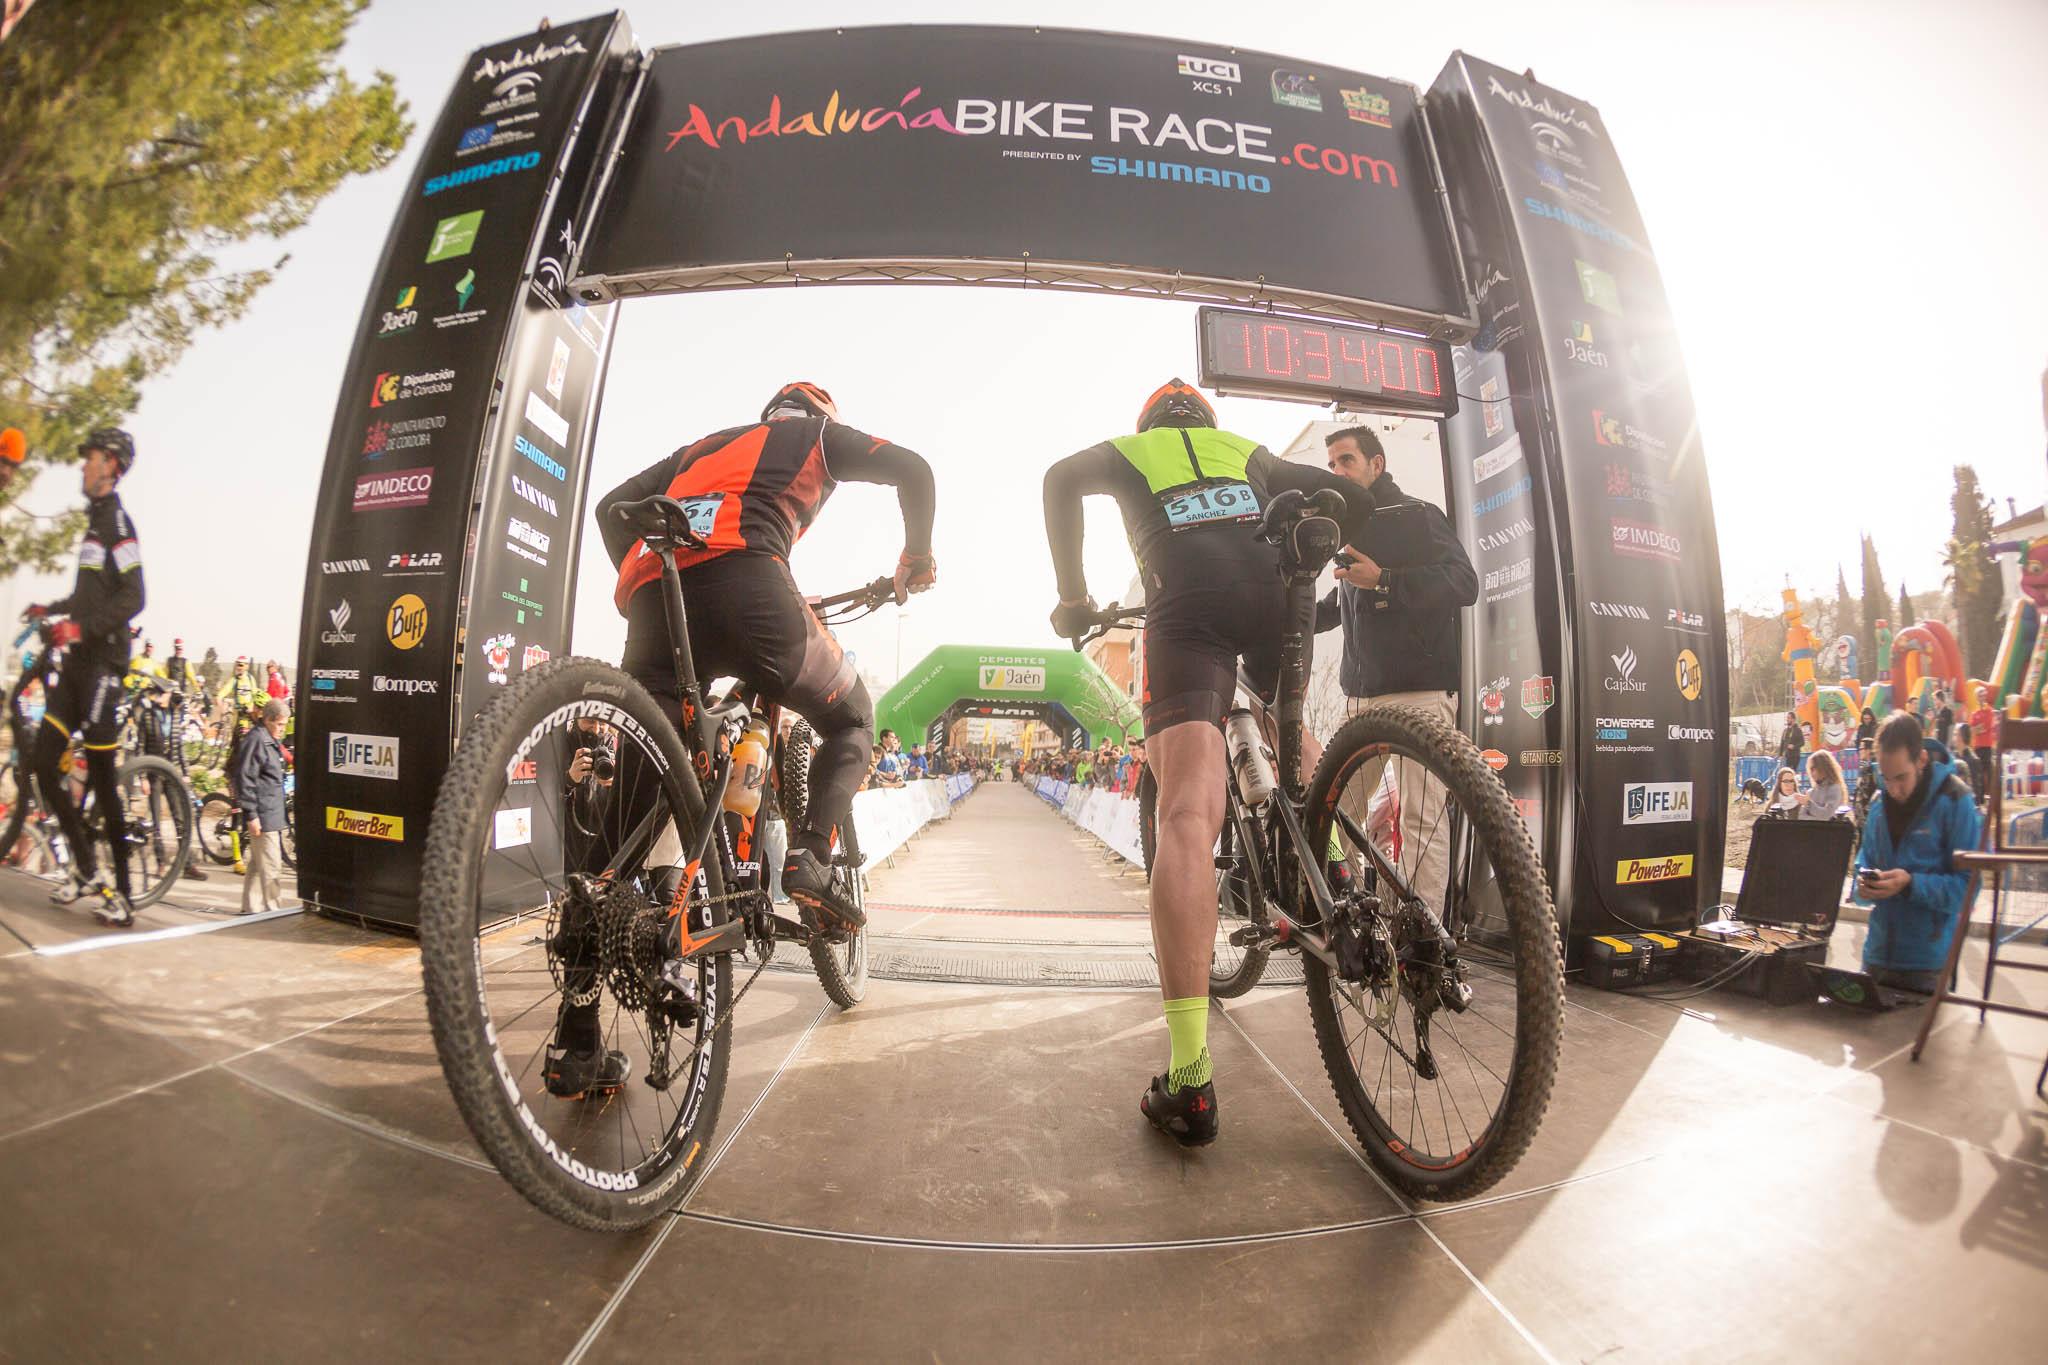 20160221-Andalucia-Bike-Race-2016-B29B9767